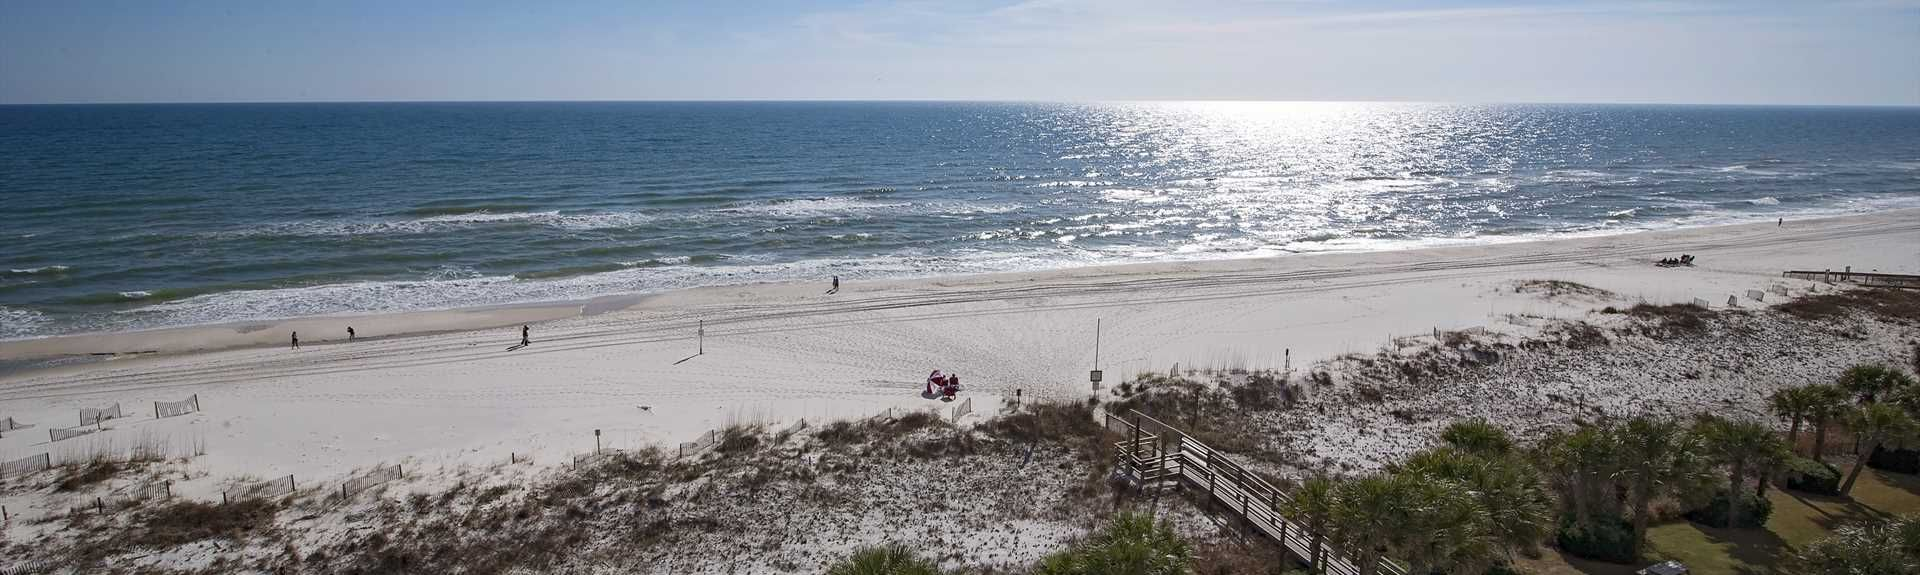 Regency Isle, Orange Beach, AL, USA